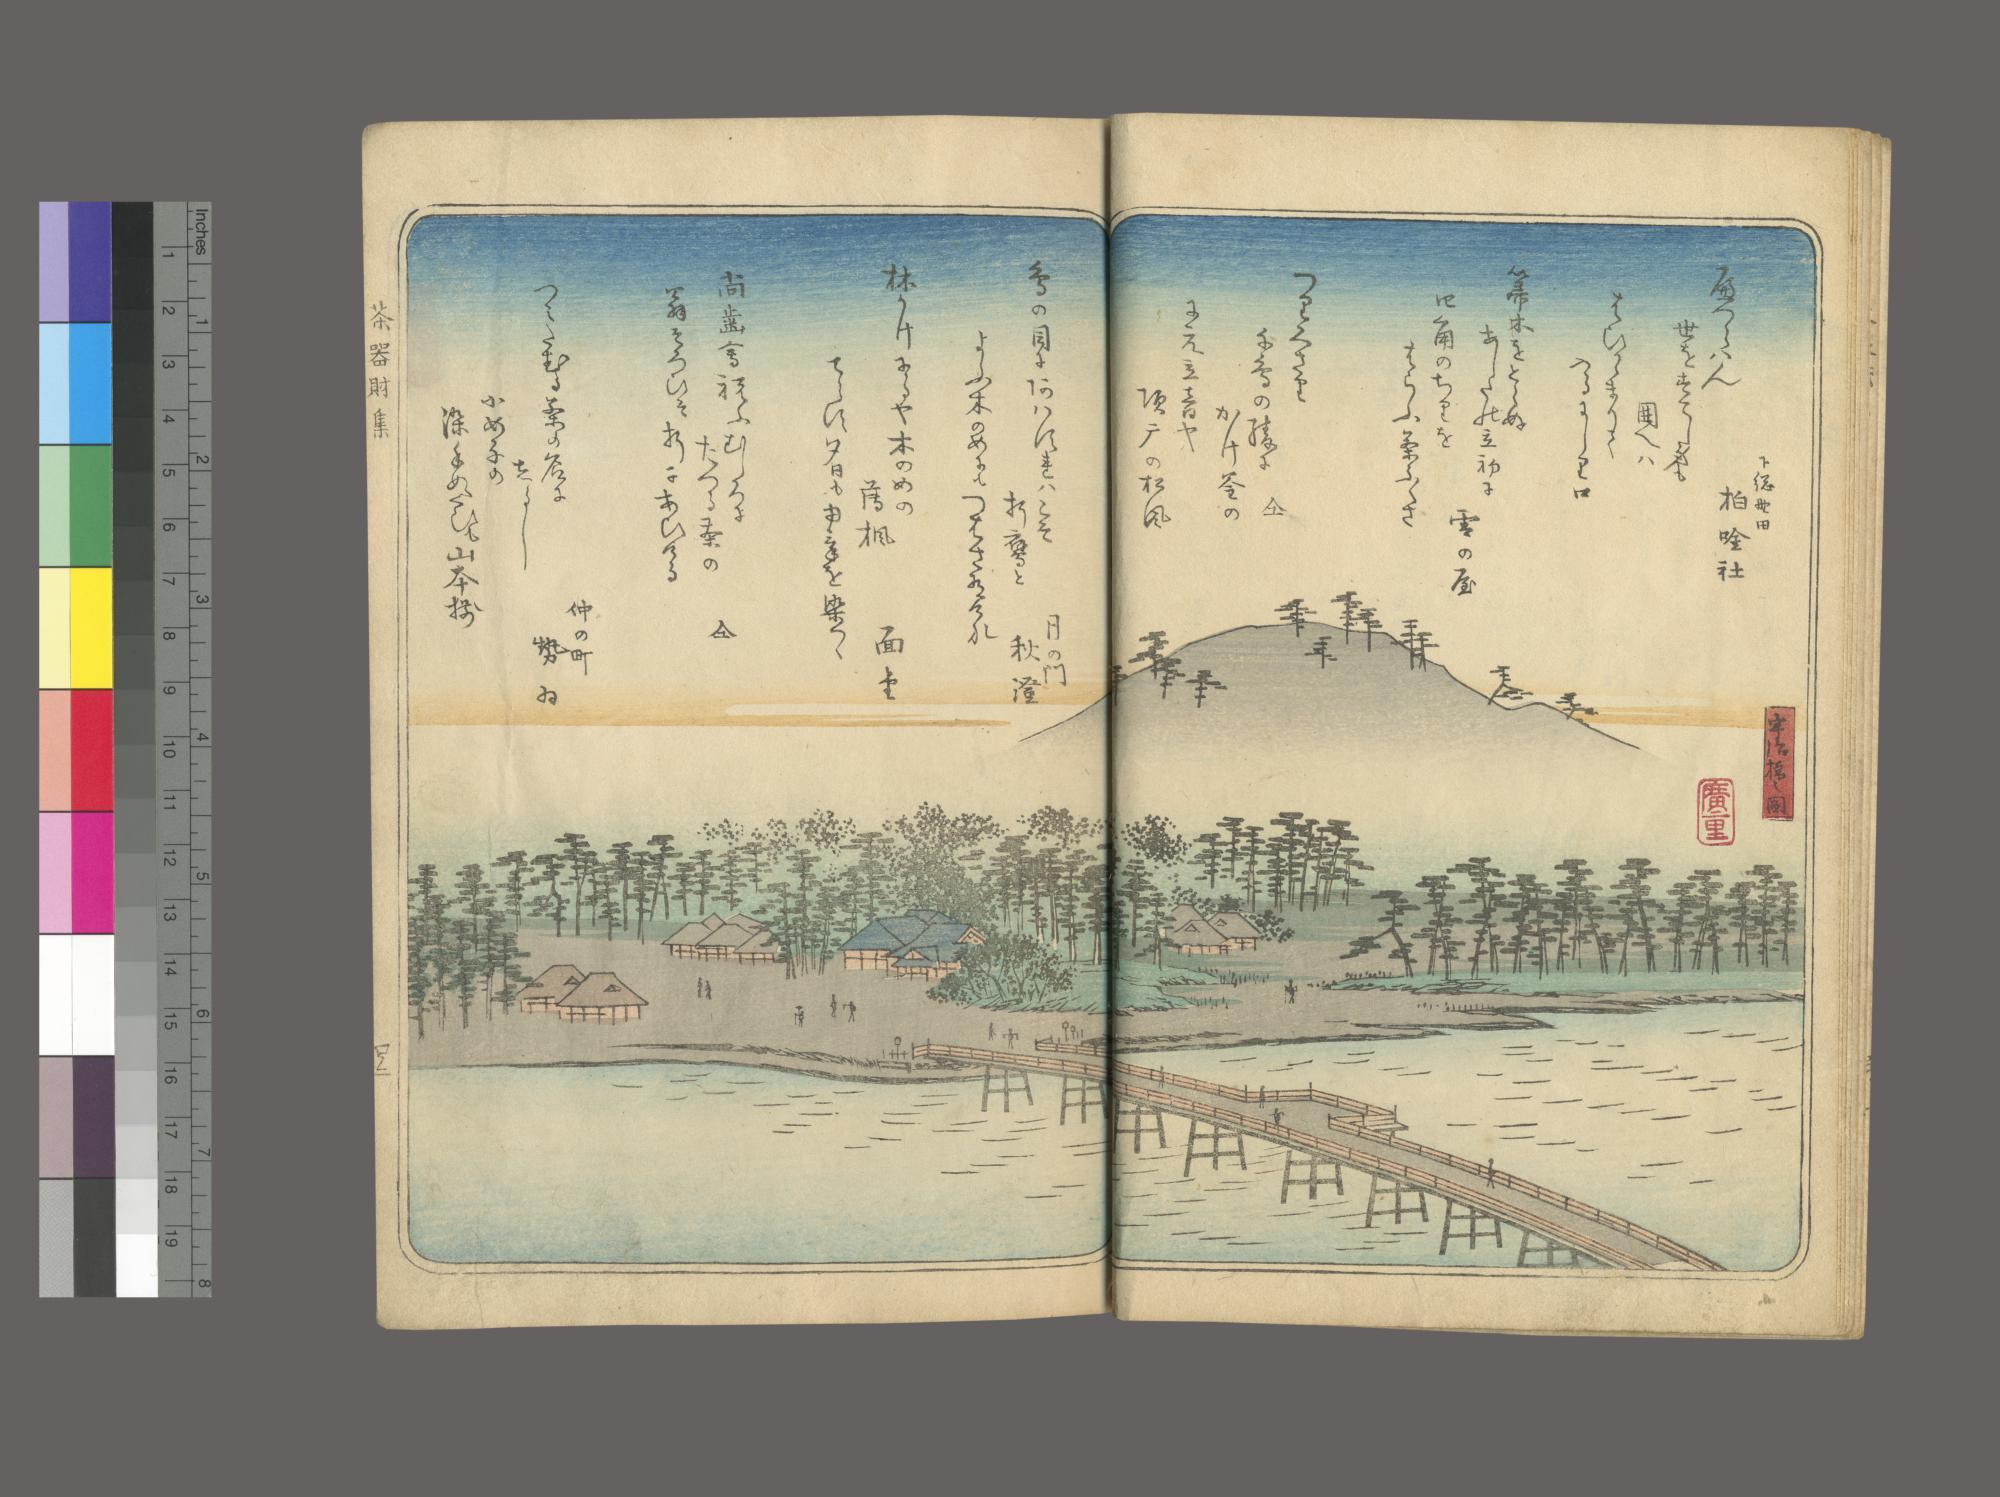 Kyōka chakizai gazōshū